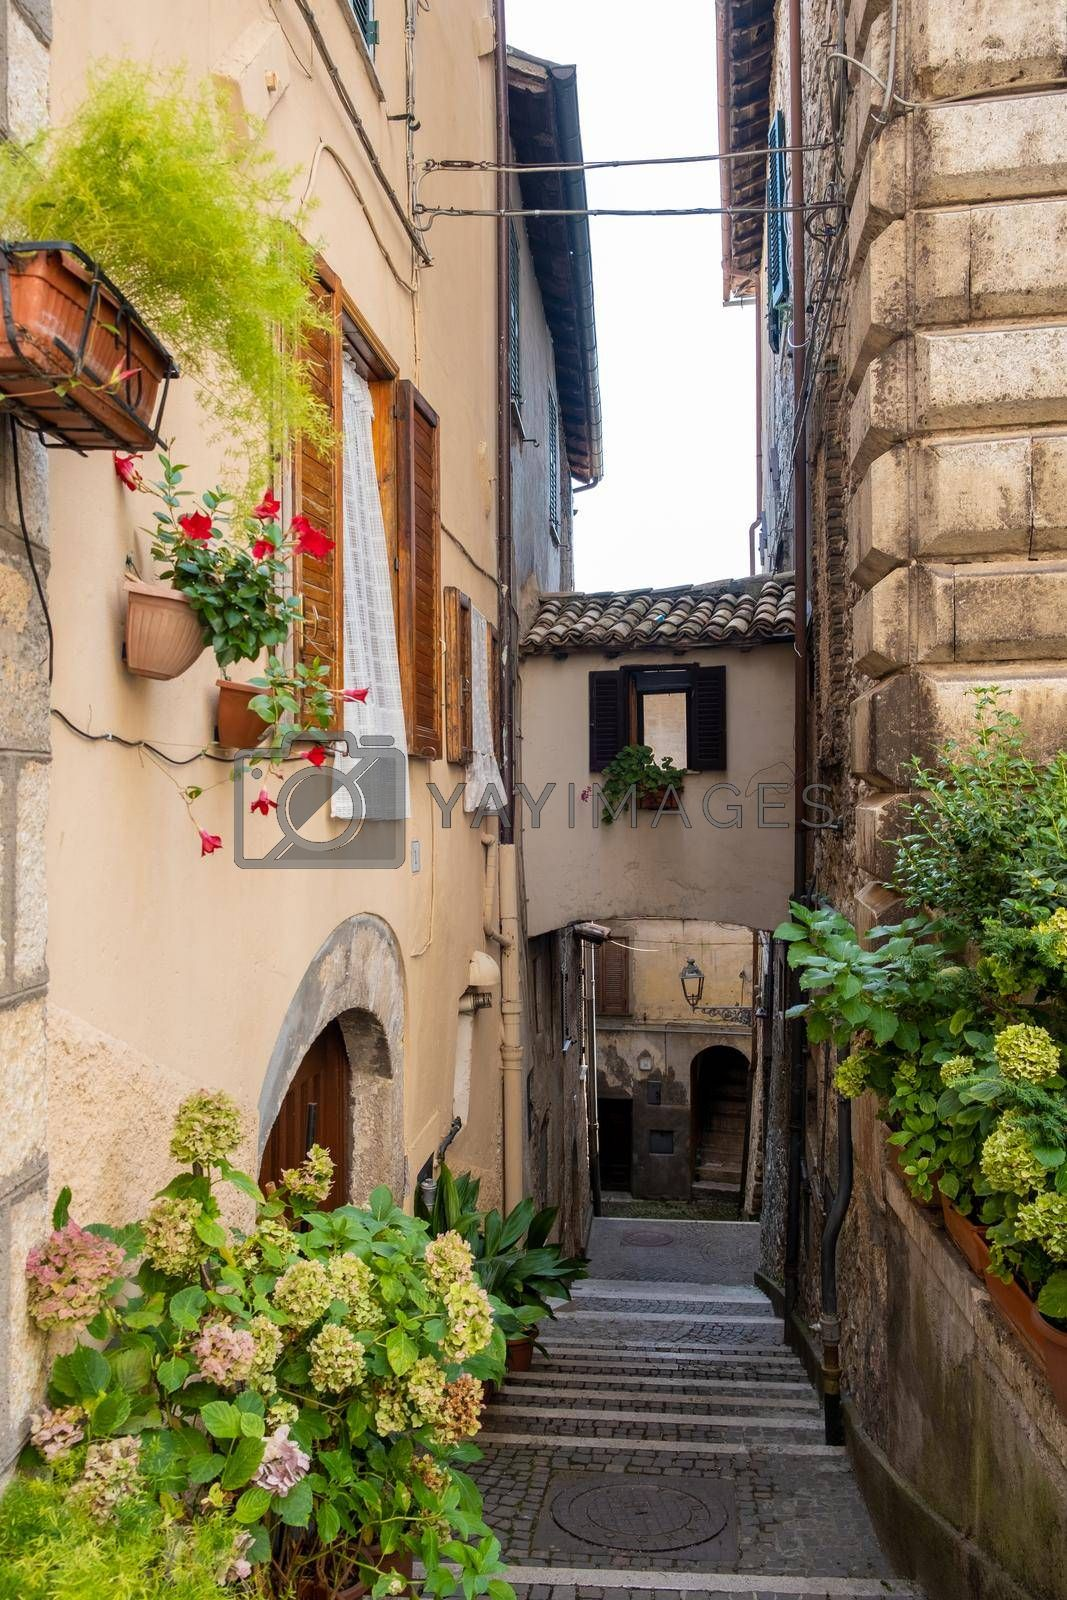 Overview of Fiuggi in Italy, Scenic sight in Fiuggi, province of Frosinone, Lazio, central Italy. Europe September 2020